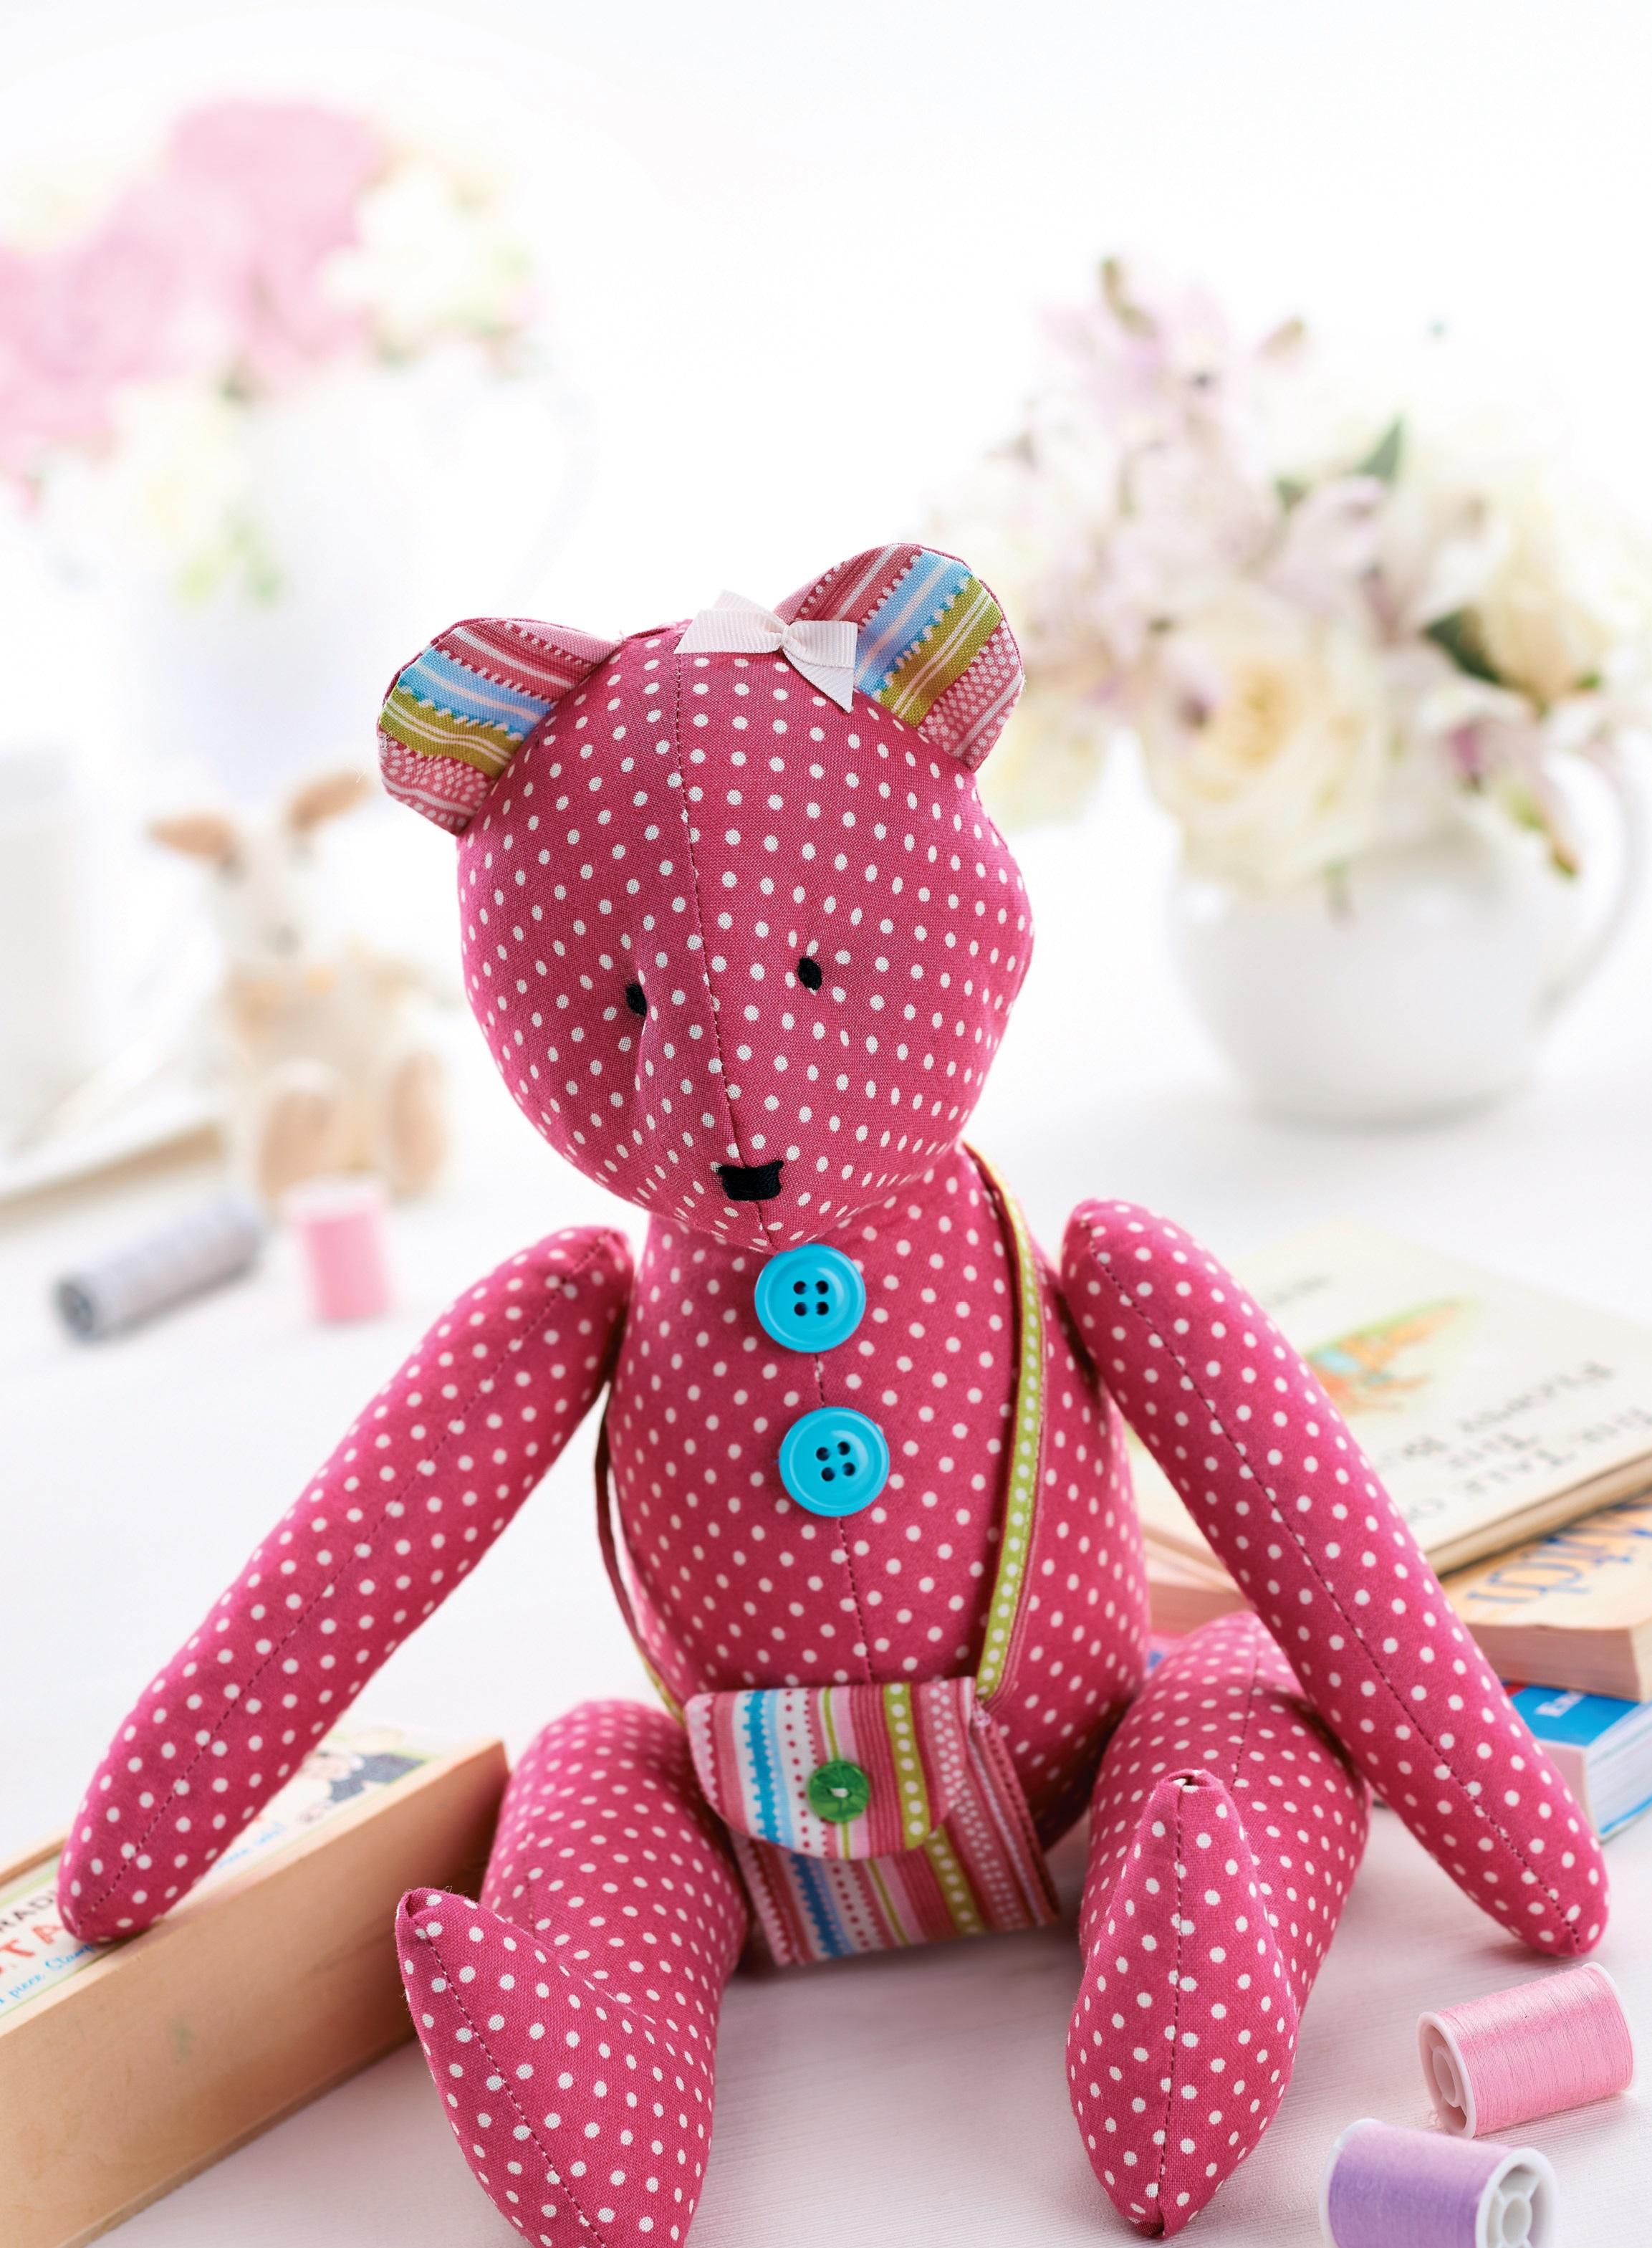 Flo Teddy Bear - Magazine Templates - Sew Magazine